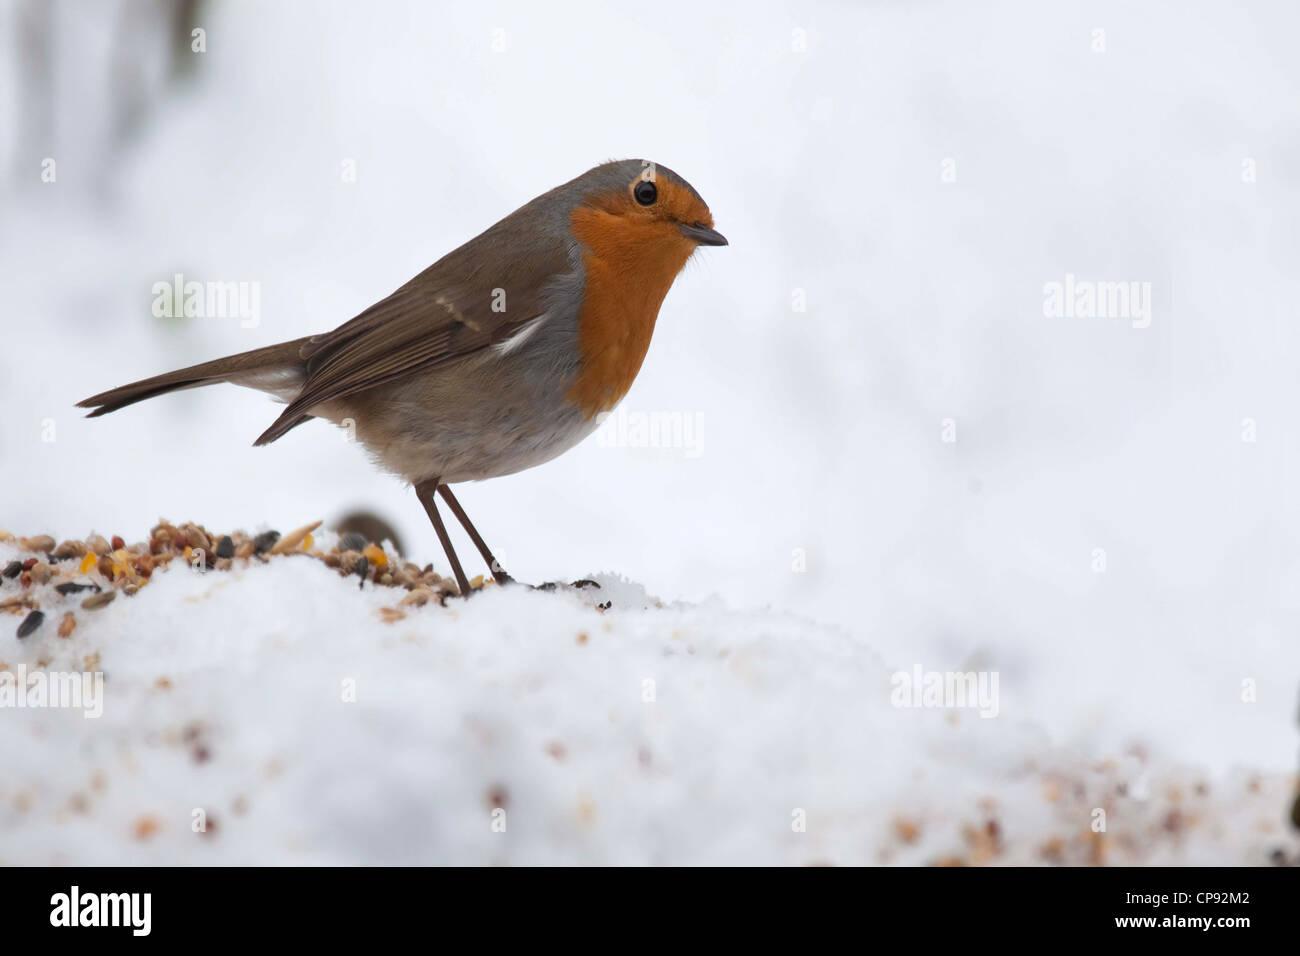 European Robin, Feeding in snow - Stock Image